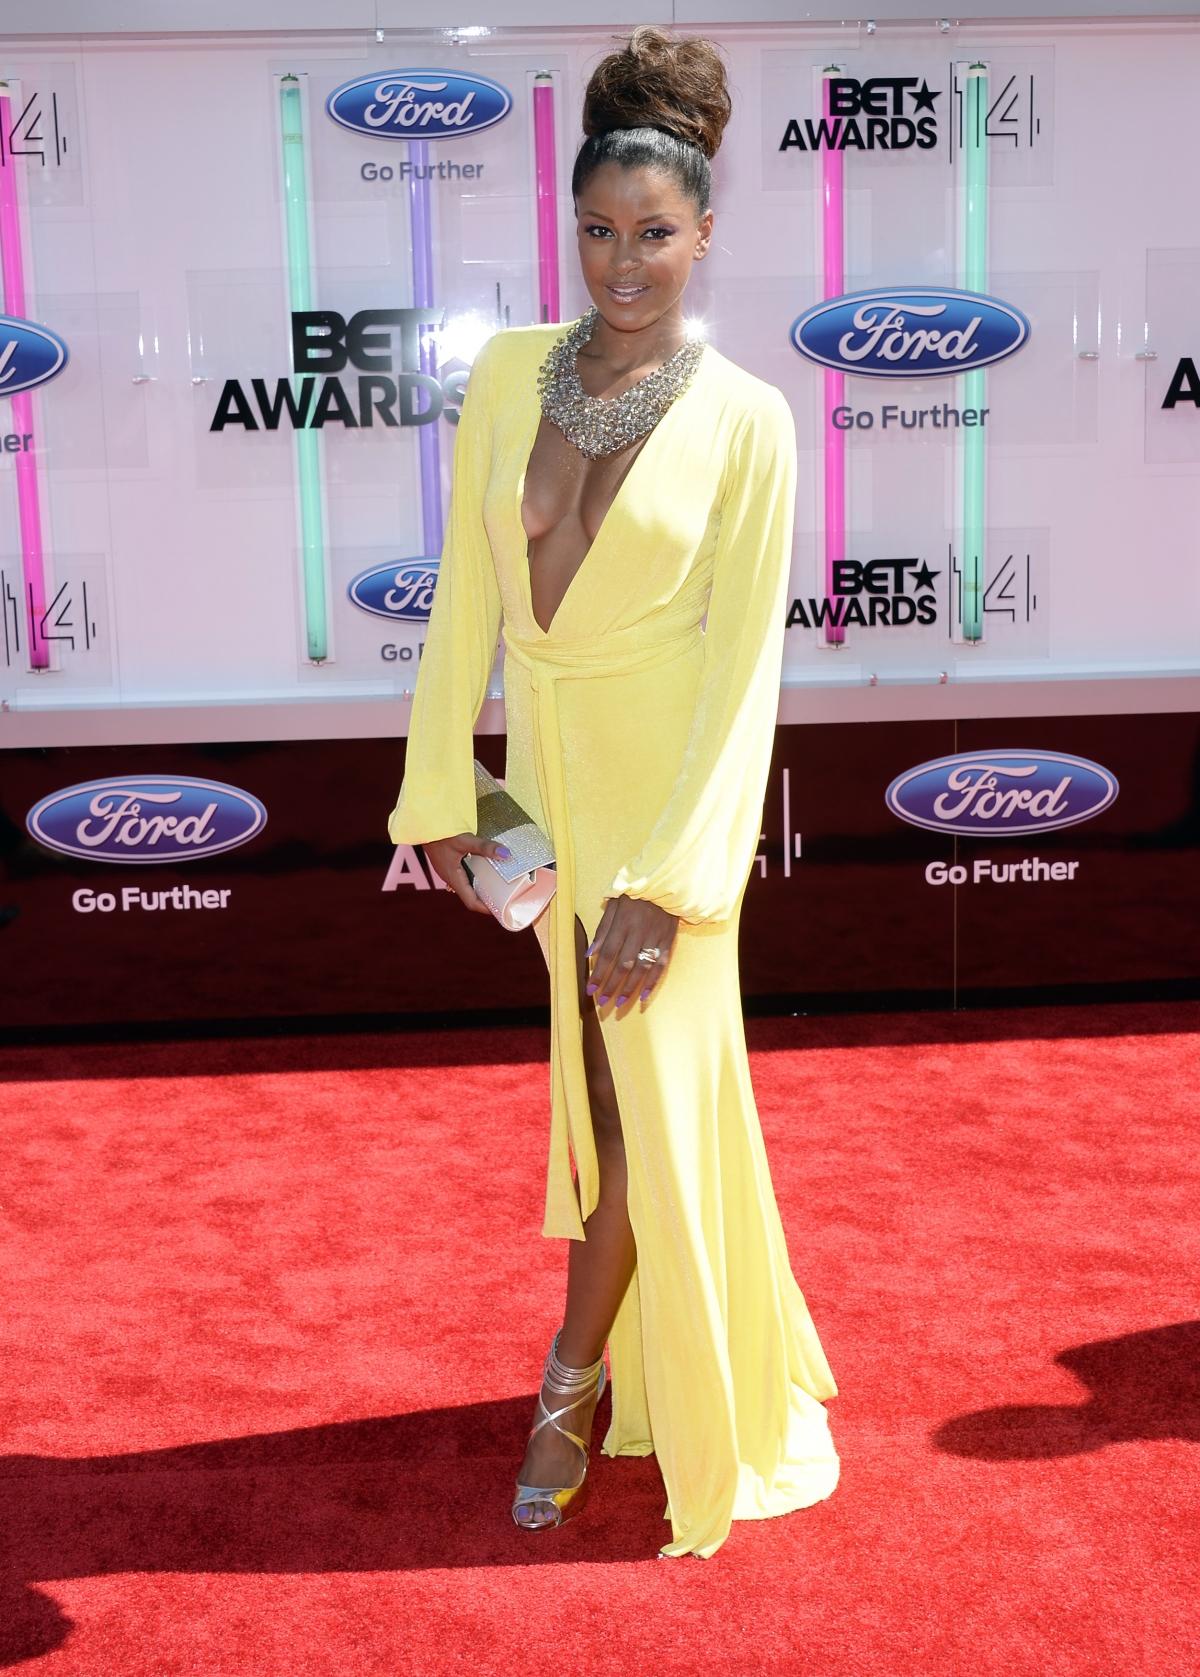 Claudia Jordan arrives at the 2014 BET Awards in Los Angeles, California June 29, 2014.